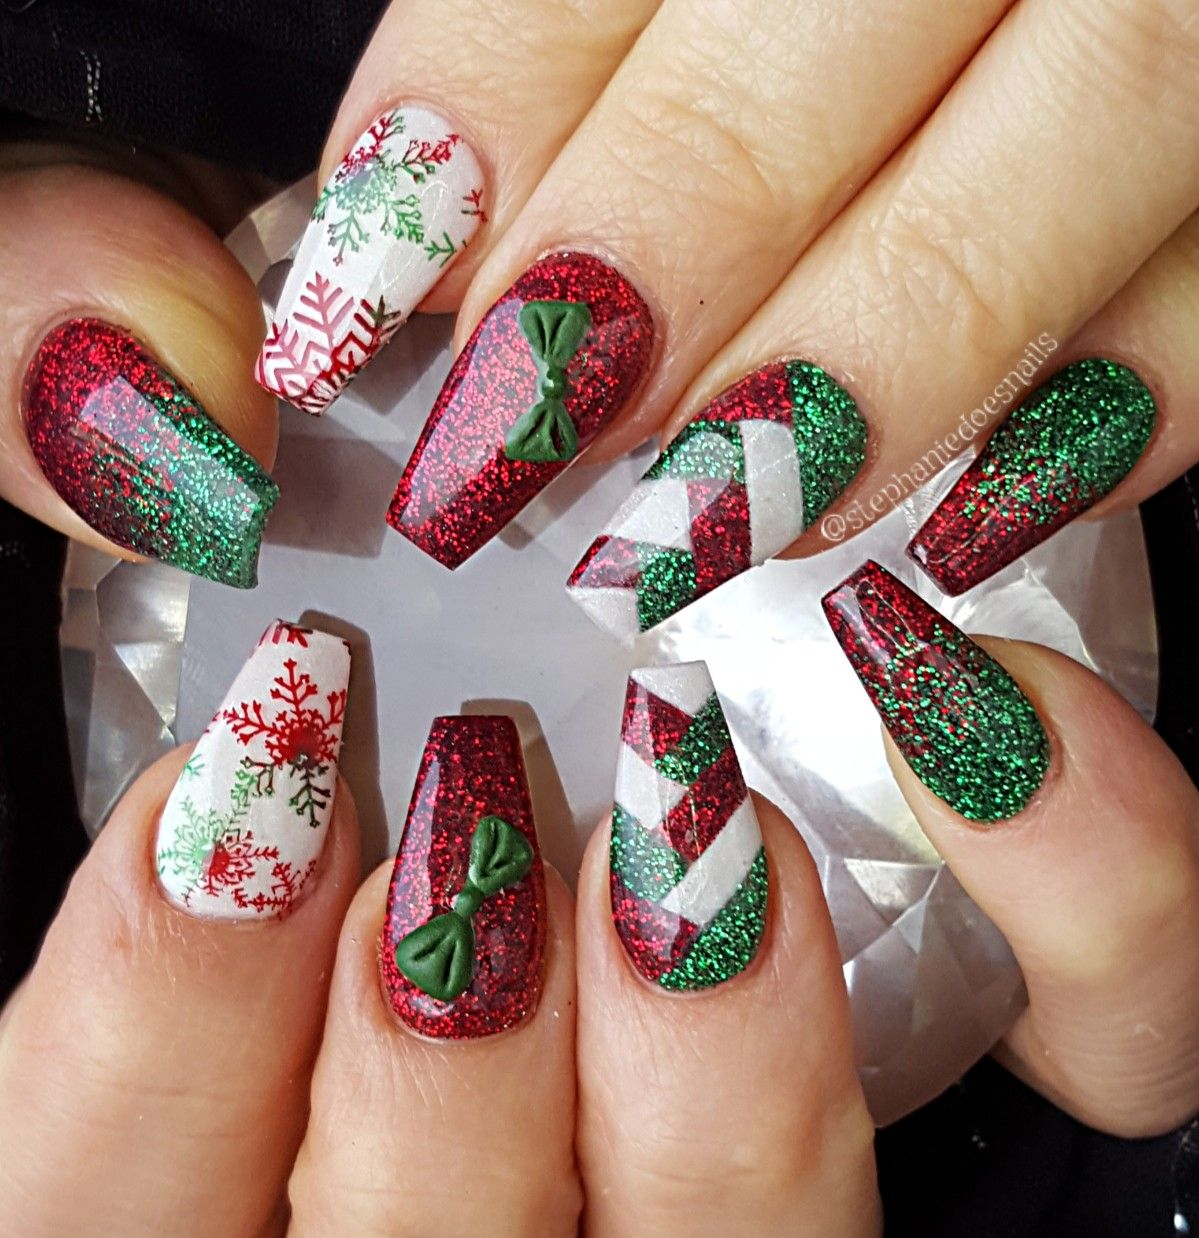 Cute Christmas Acrylic Nail Designs: Christmas Nail Designs Acrylic By Monique Otero On Nails